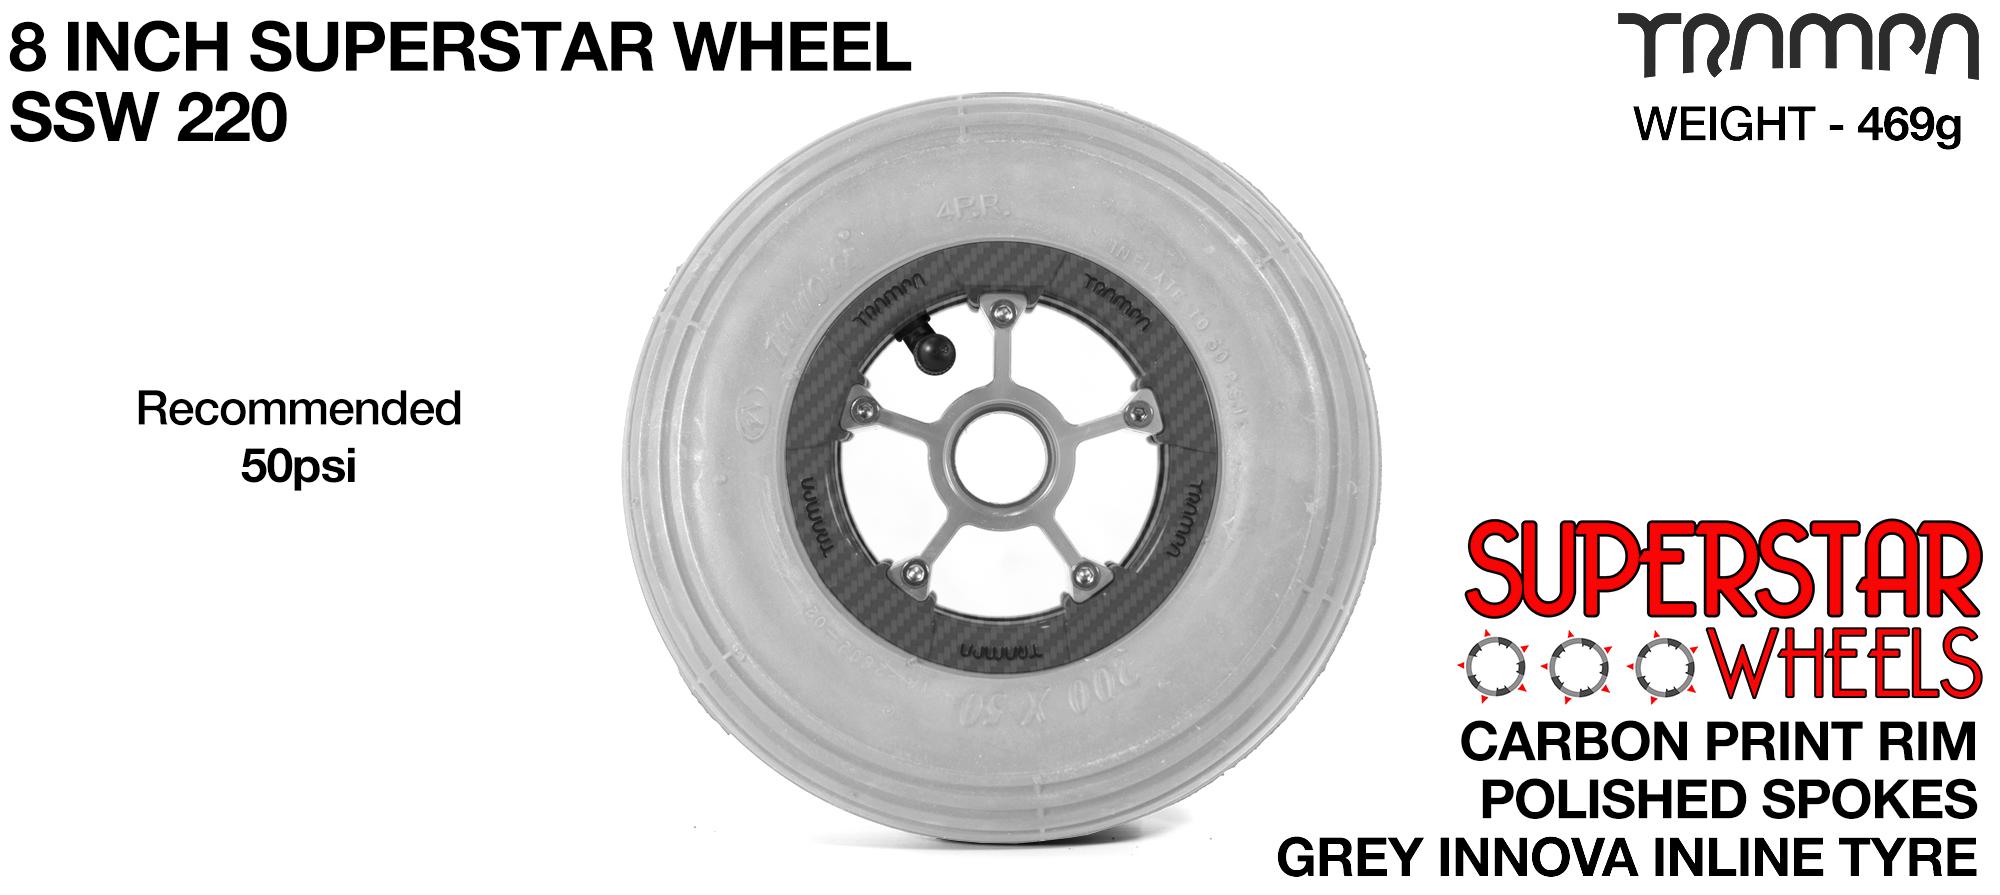 Superstar 8 Inch Wheel - Carbon Superstar Rim Silver Anodised Spokes & Grey 8 Inch Inline Tyre